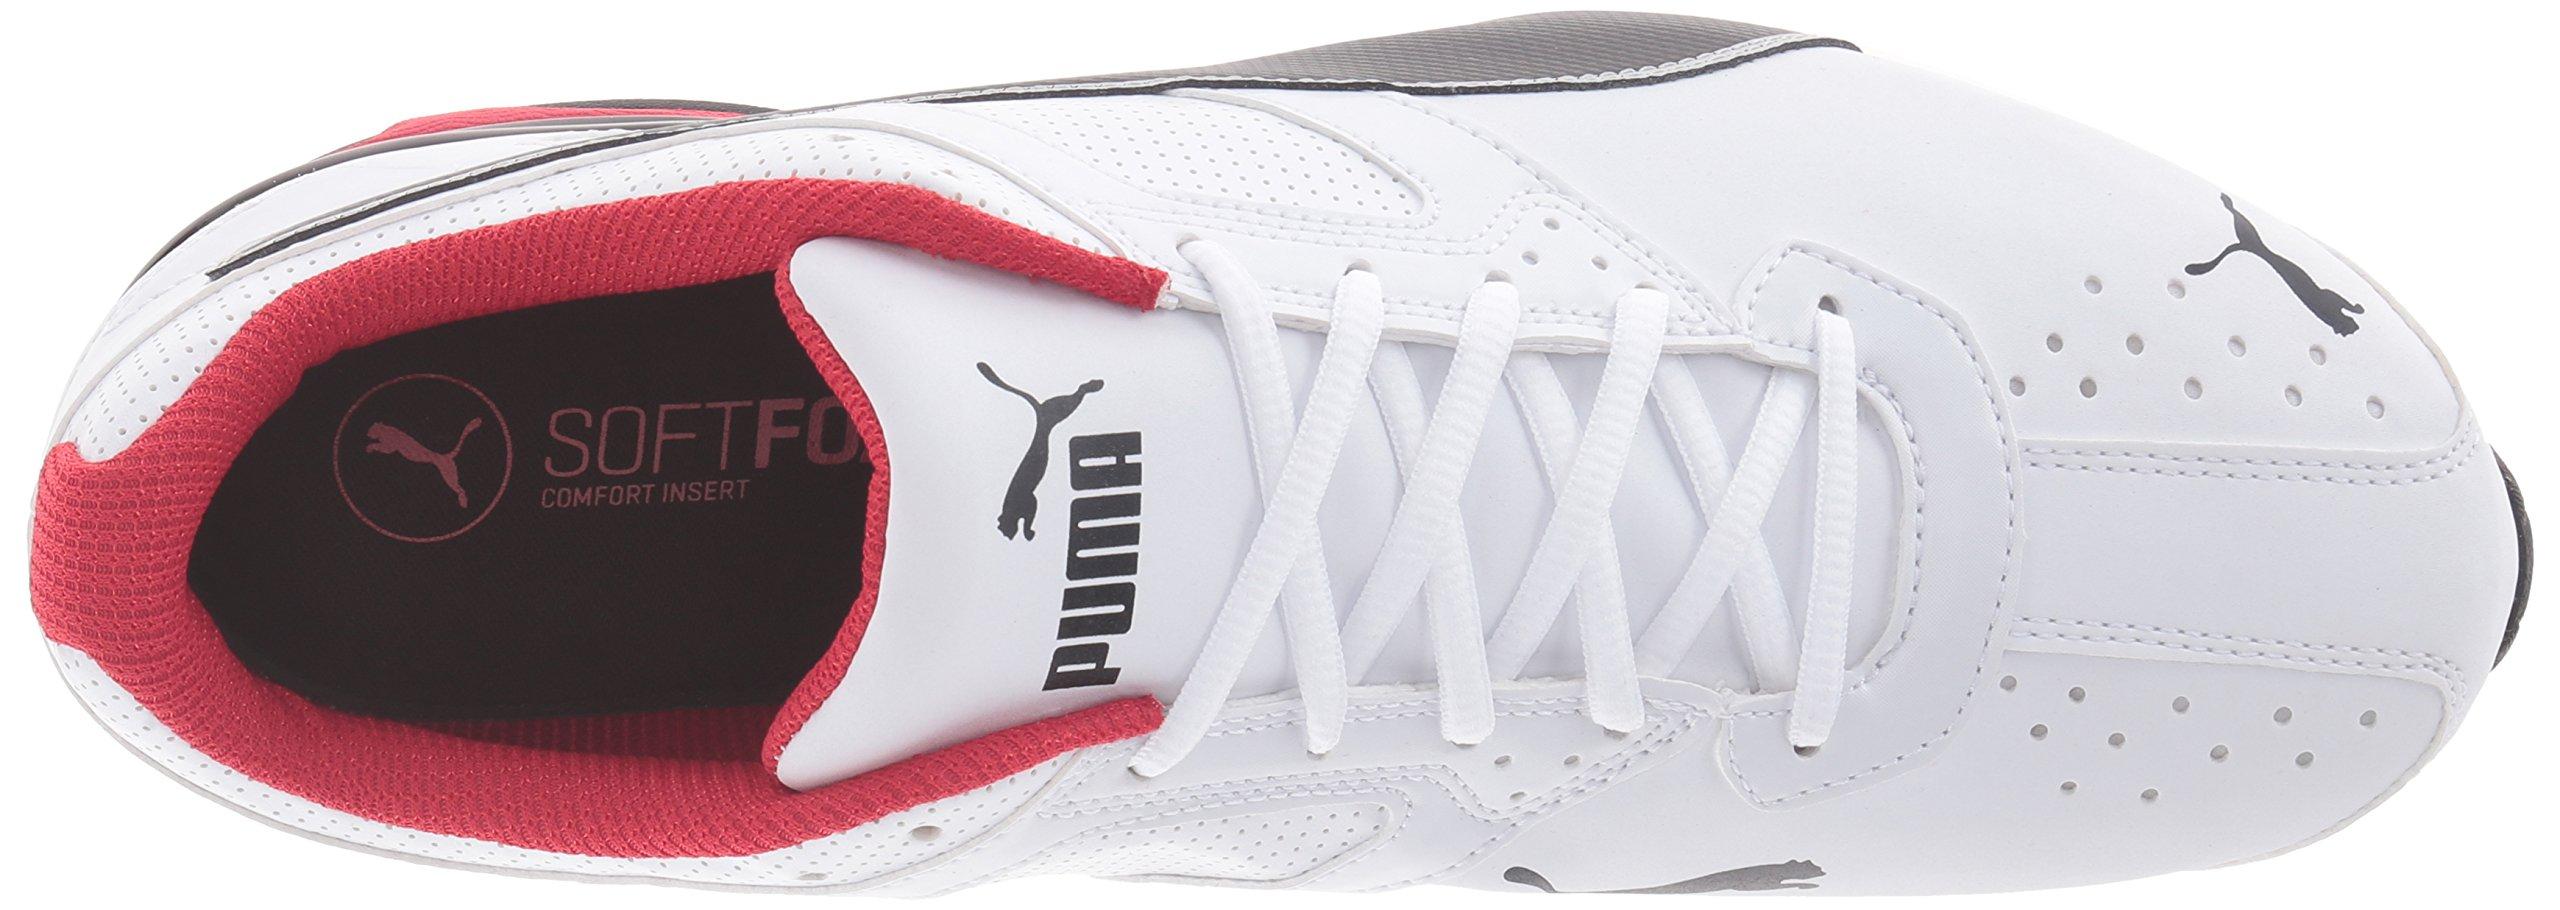 PUMA Men's Tazon 6 FM Puma White/ Puma Black/ Puma Silver Running Shoe - 7.5 2E US by PUMA (Image #7)